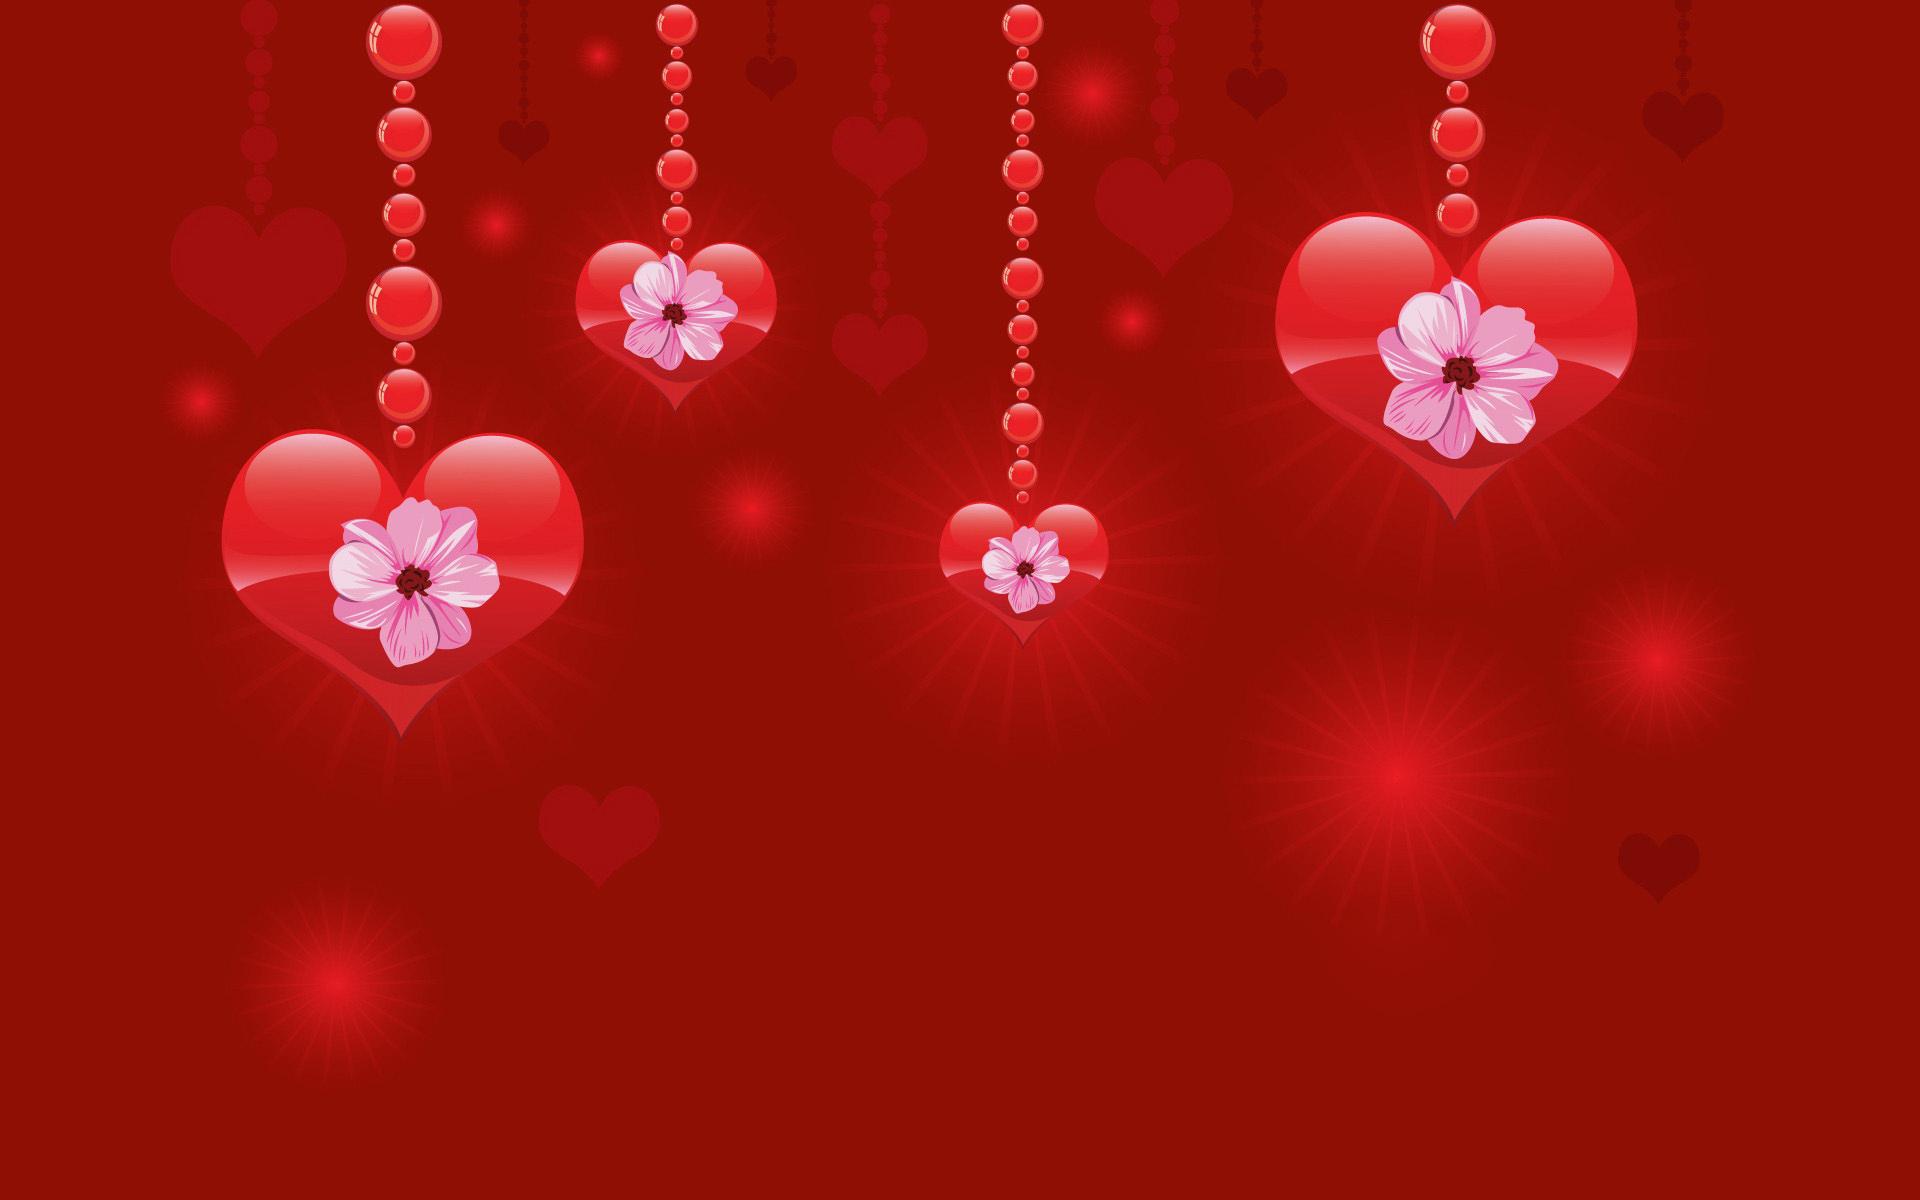 Valentine Desktop Backgrounds (51 Wallpapers) – Adorable Wallpapers